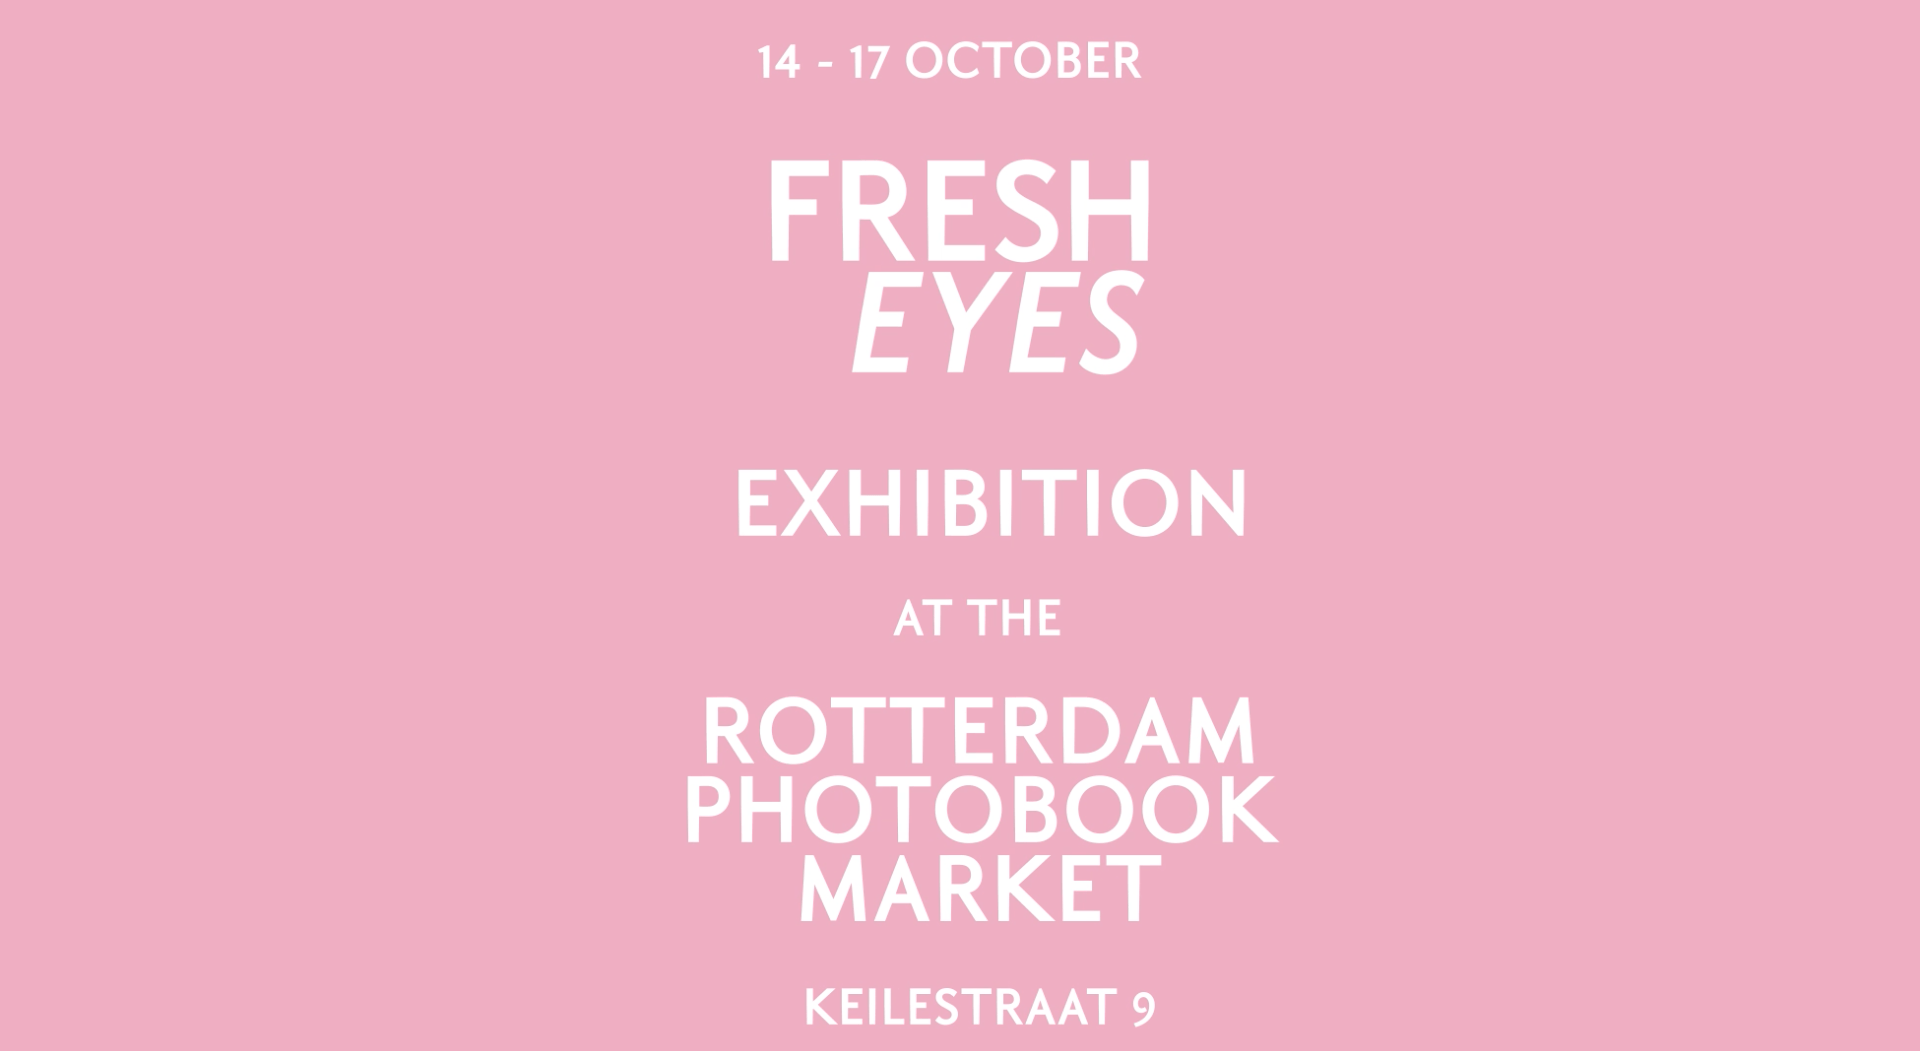 Rotterdam Photo Book Market & FRESH EYES